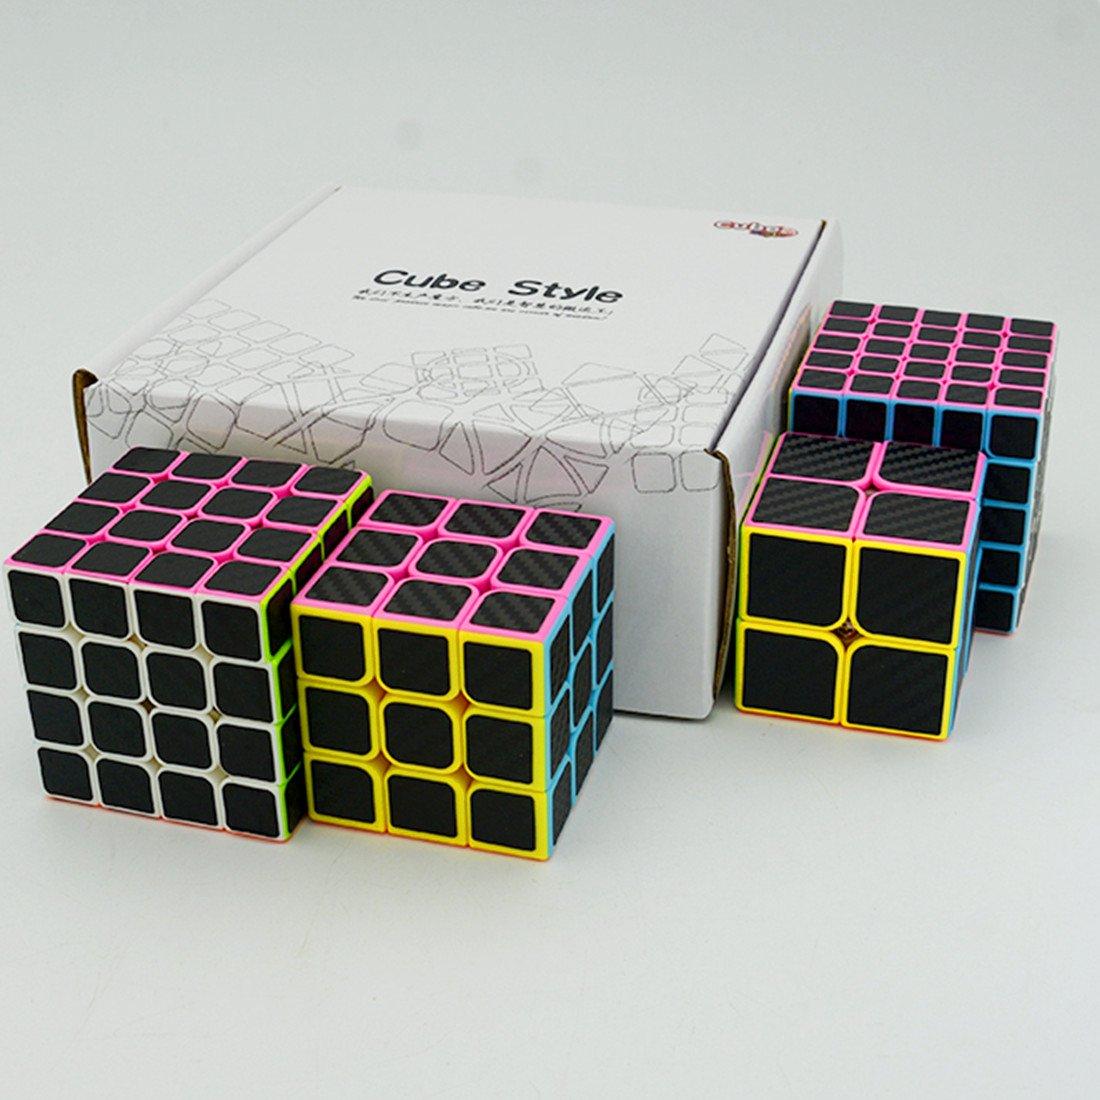 CuberSpeed Magic cube 4x4 Stickerless Bright with black sticker Speed cube Phantom Carbon fiber sticker 4x4x4 Color Magic cube Yongjun